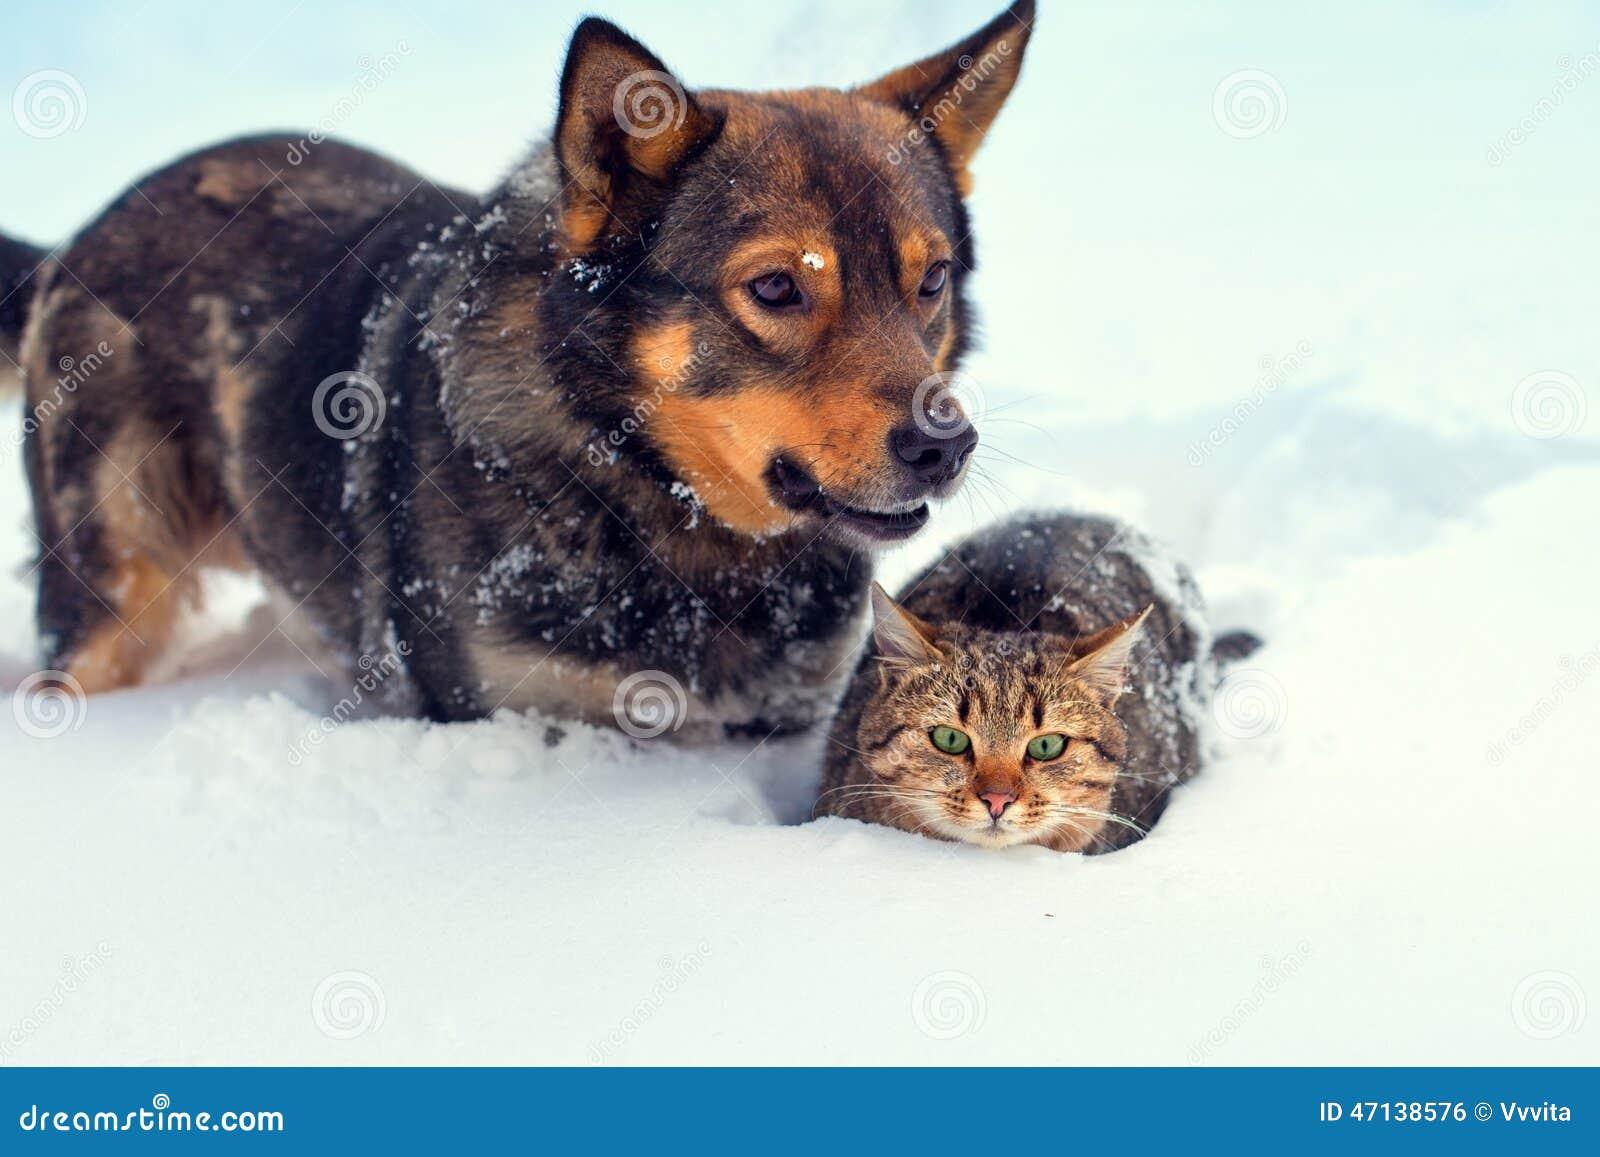 Outdoor Christmas Animals